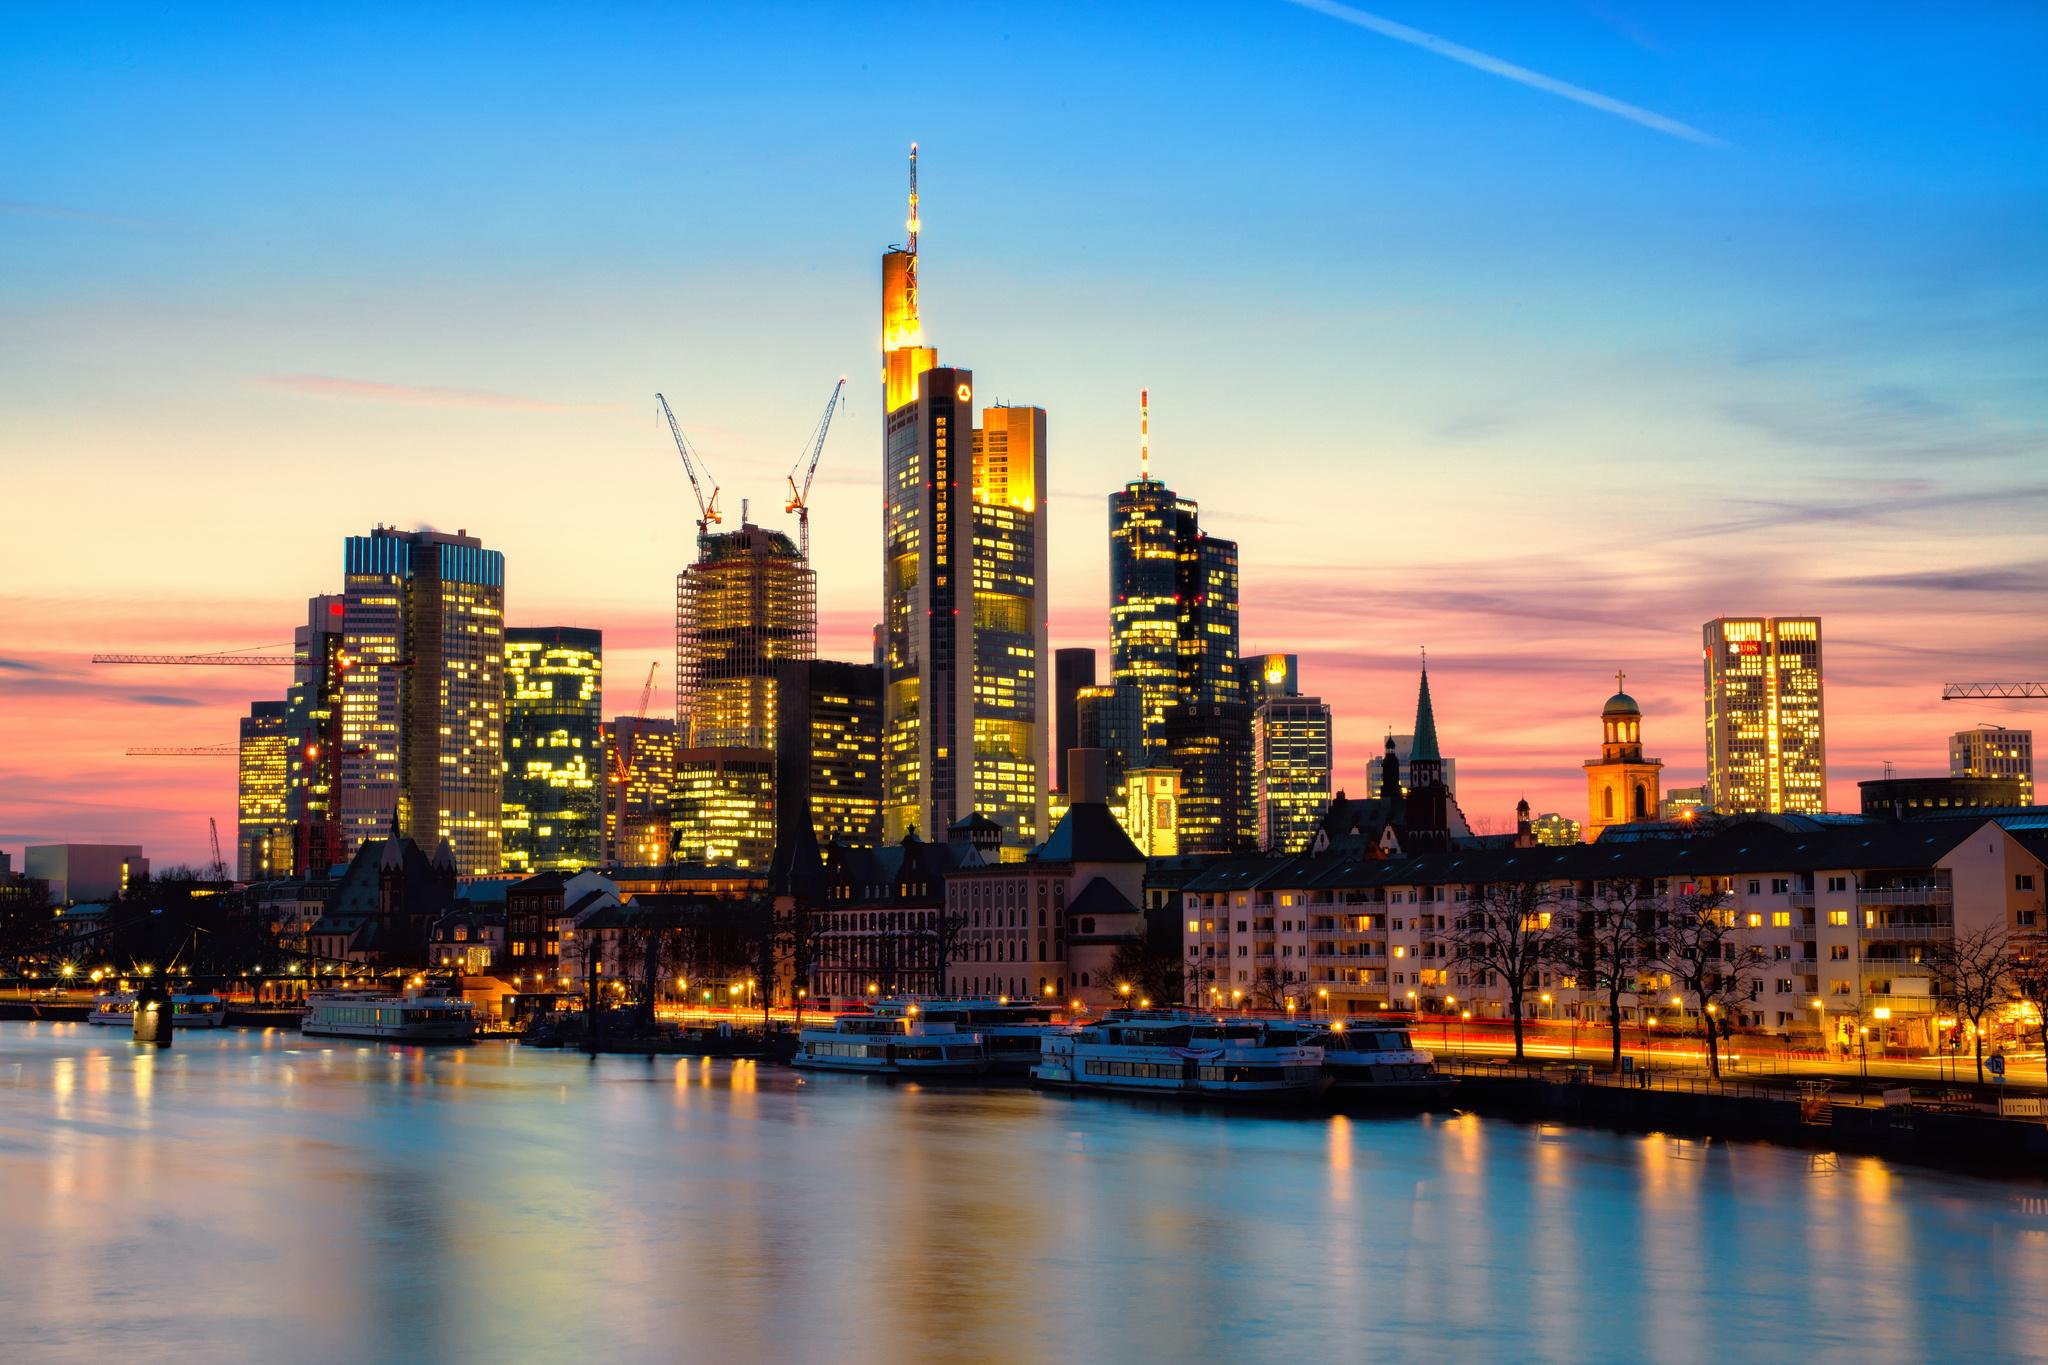 25 Frankfurt HD Wallpapers | Backgrounds - Wallpaper Abyss